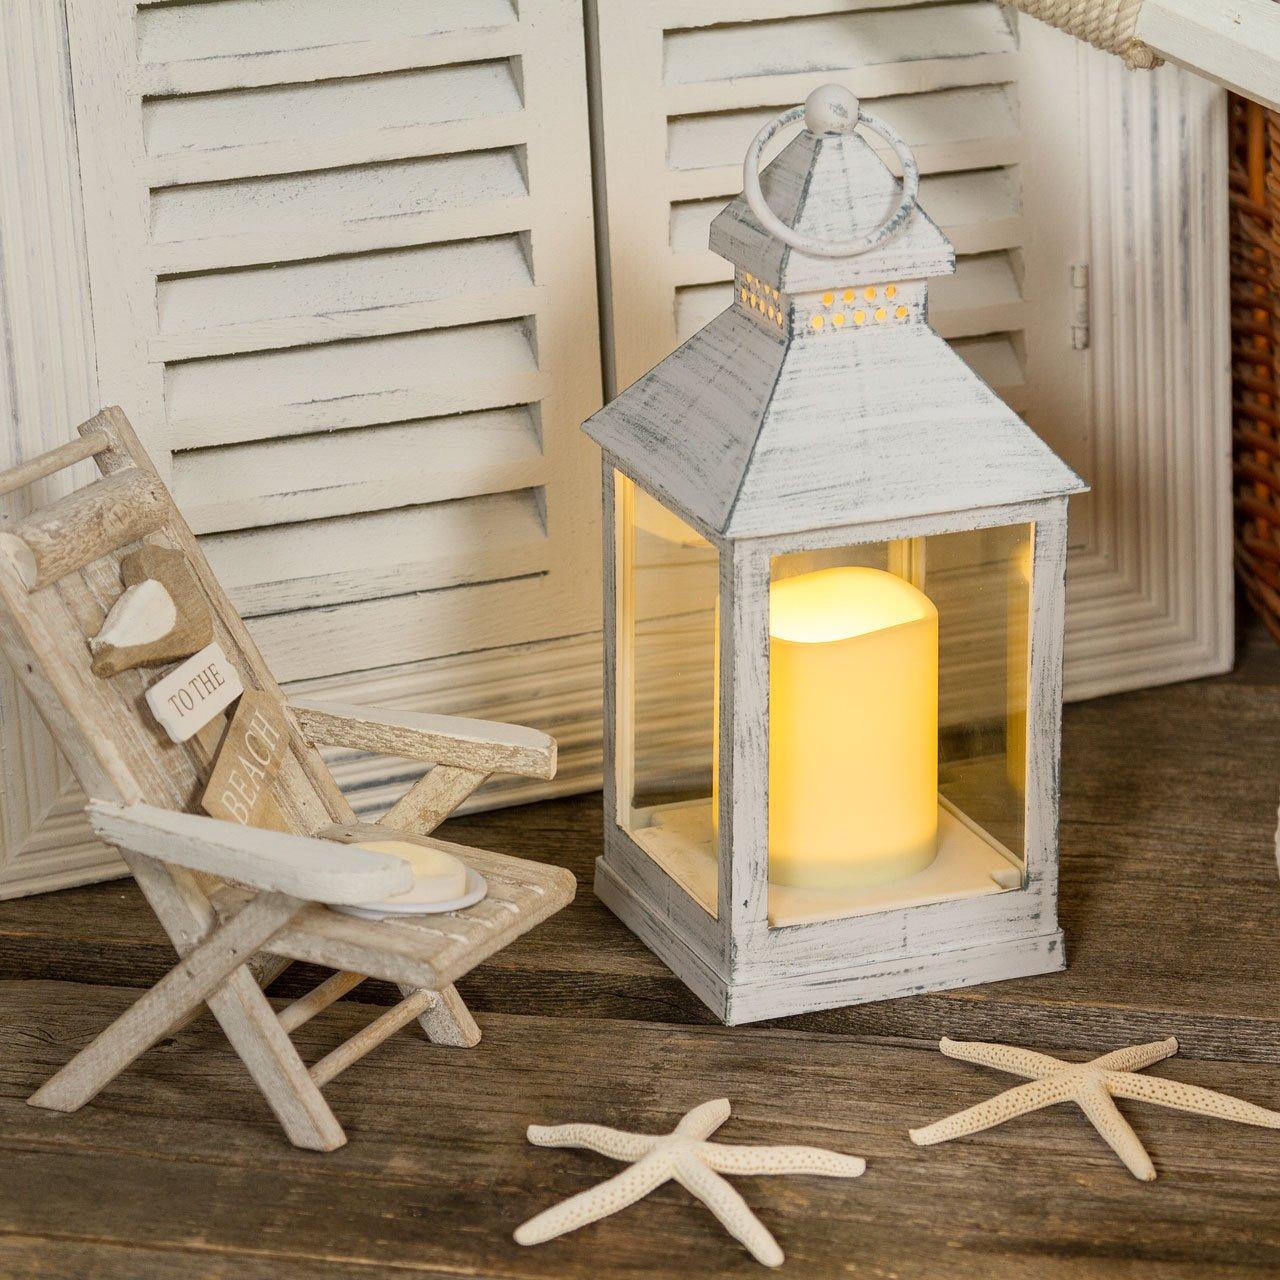 2 x Lanterna quadrata vetro bianco antico con candela, h 24 cm ...